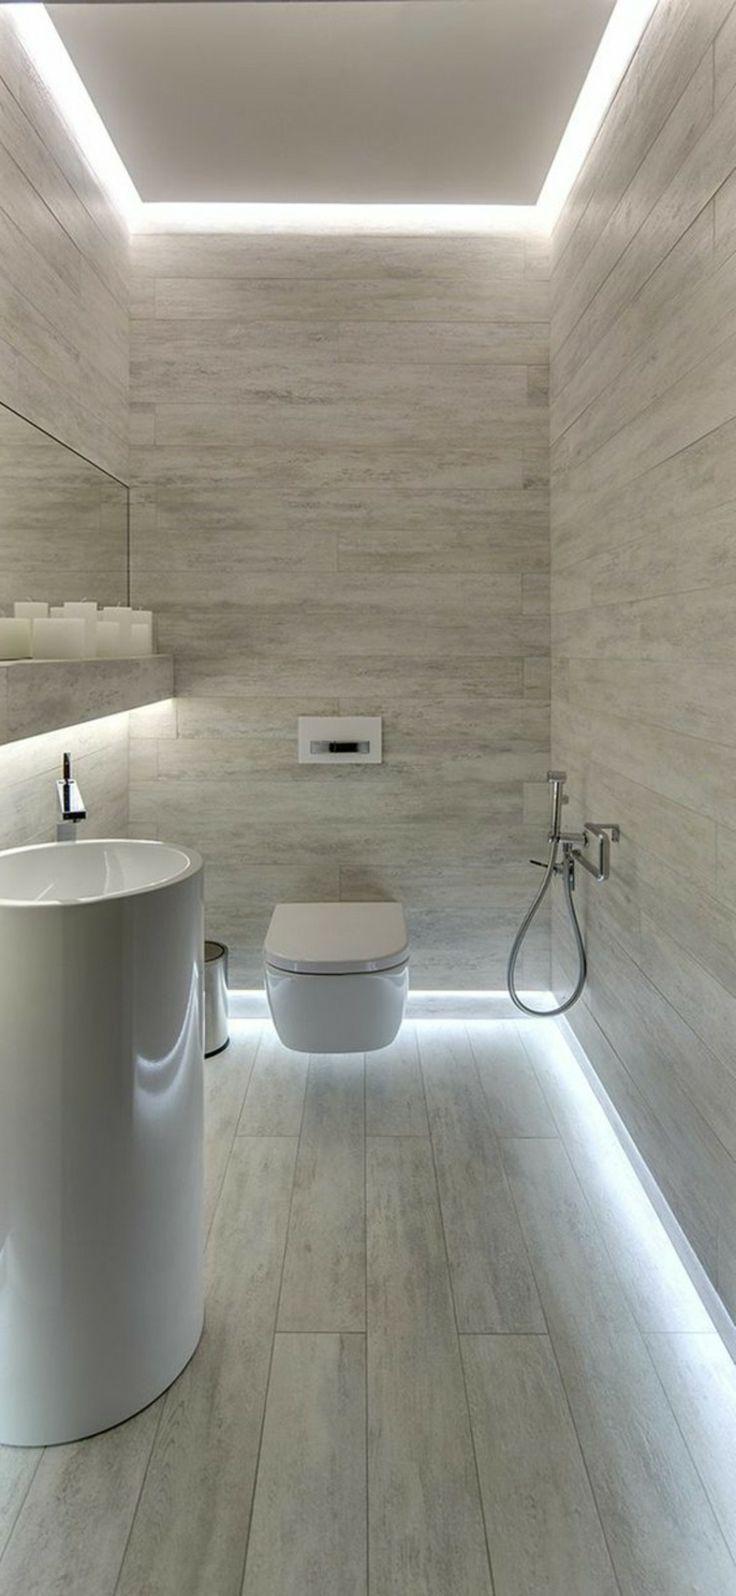 Bathroom Ceiling Led Lights In 2020 Modern Bathroom Design Ceiling Light Design Bathroom Design Luxury